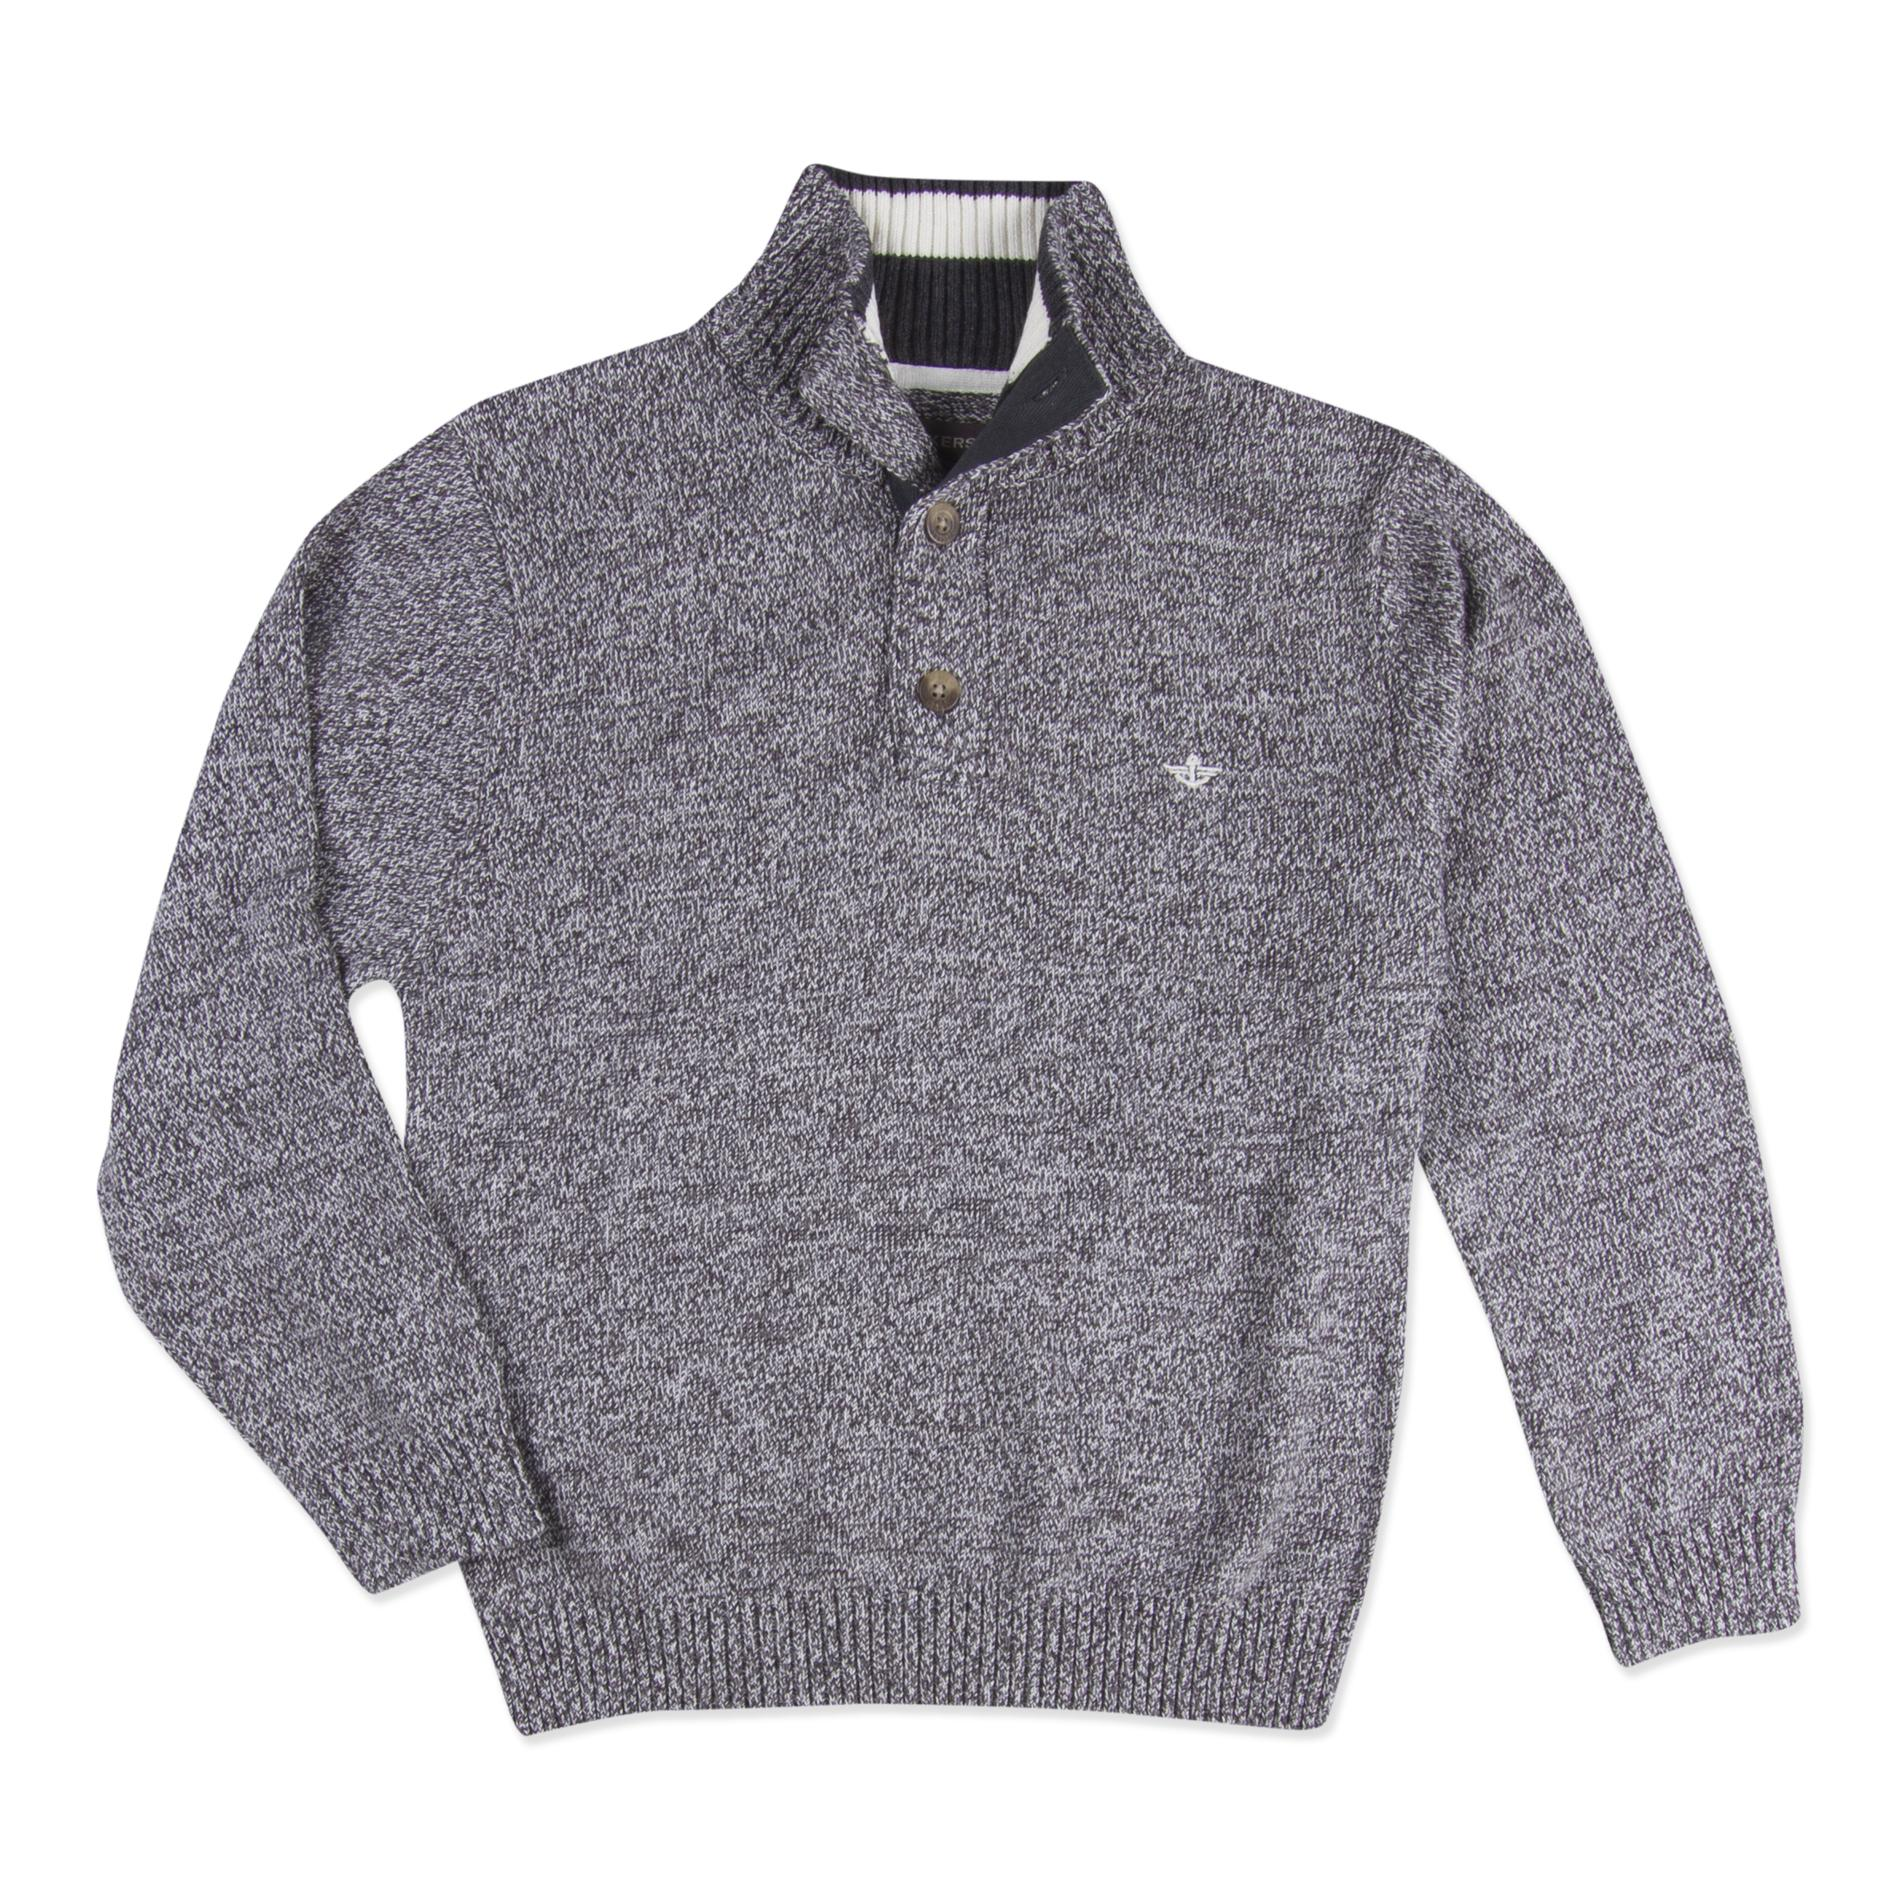 Dockers Boy's Button-Neck Sweater PartNumber: 040VA84487512P MfgPartNumber: D811000